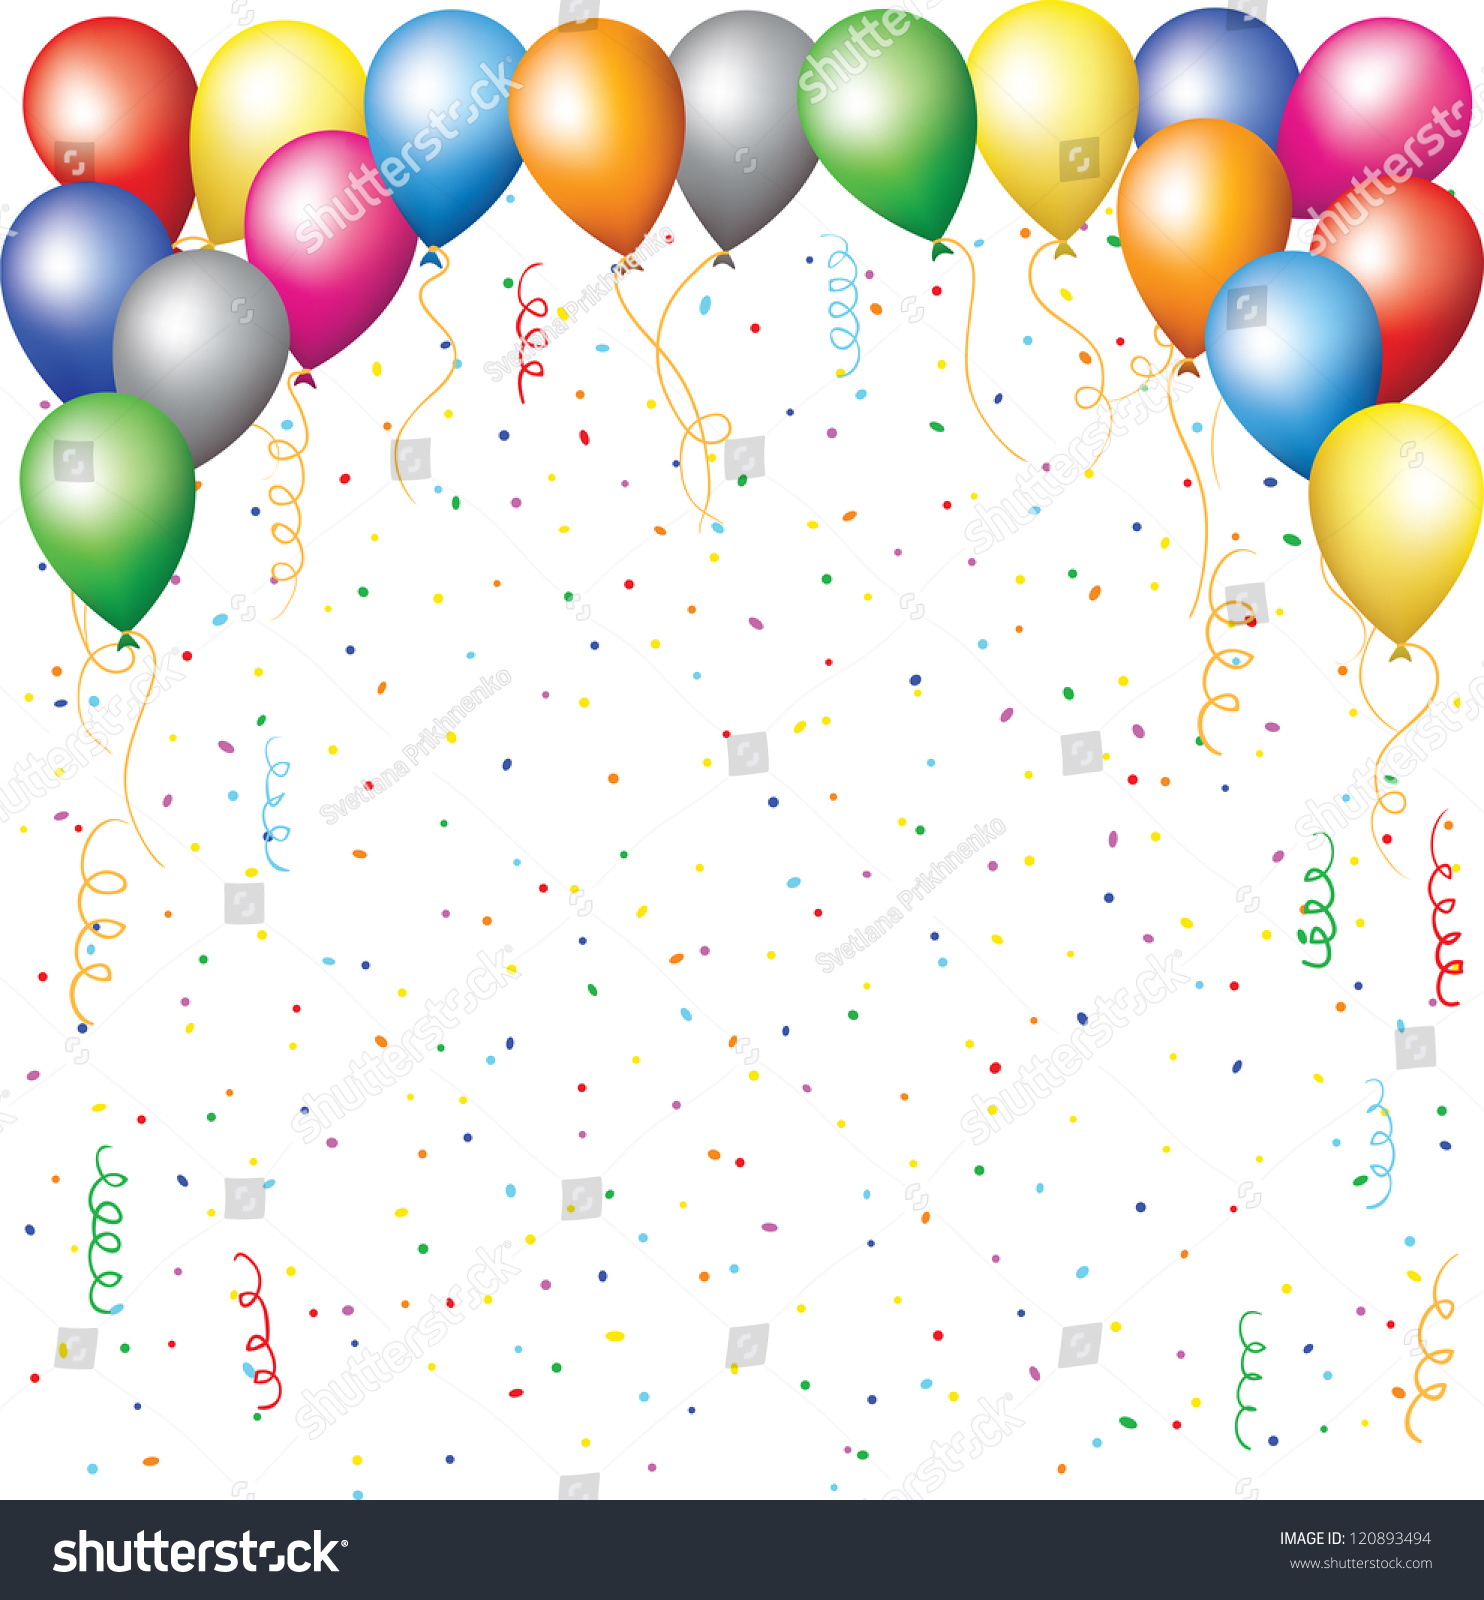 Happy Birthday Background Balloons Confetti Serpentine Stock ...